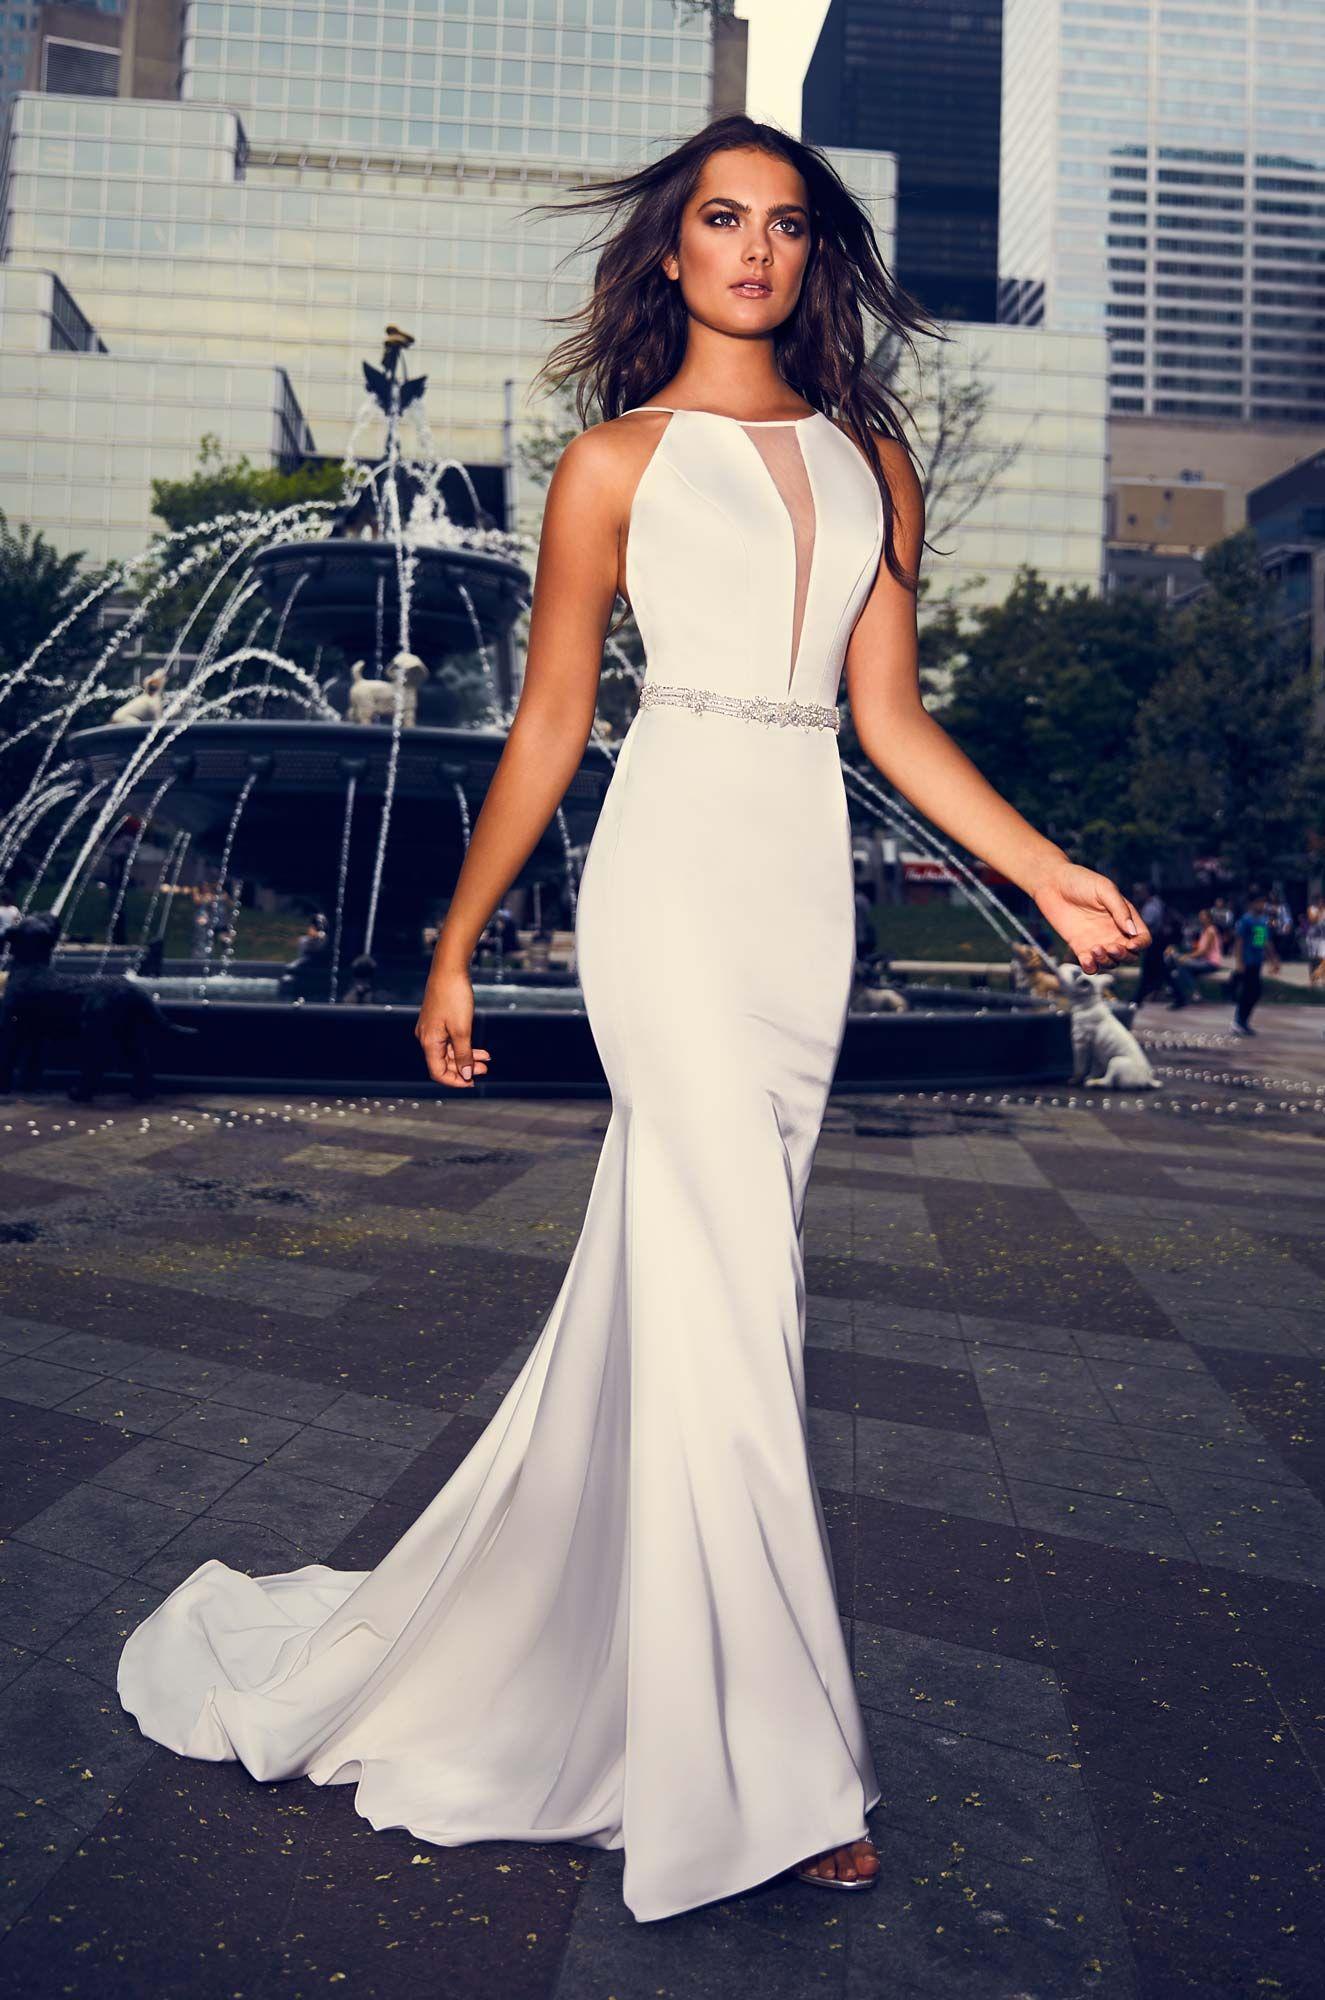 46++ Plunging lace halter wedding dress ideas